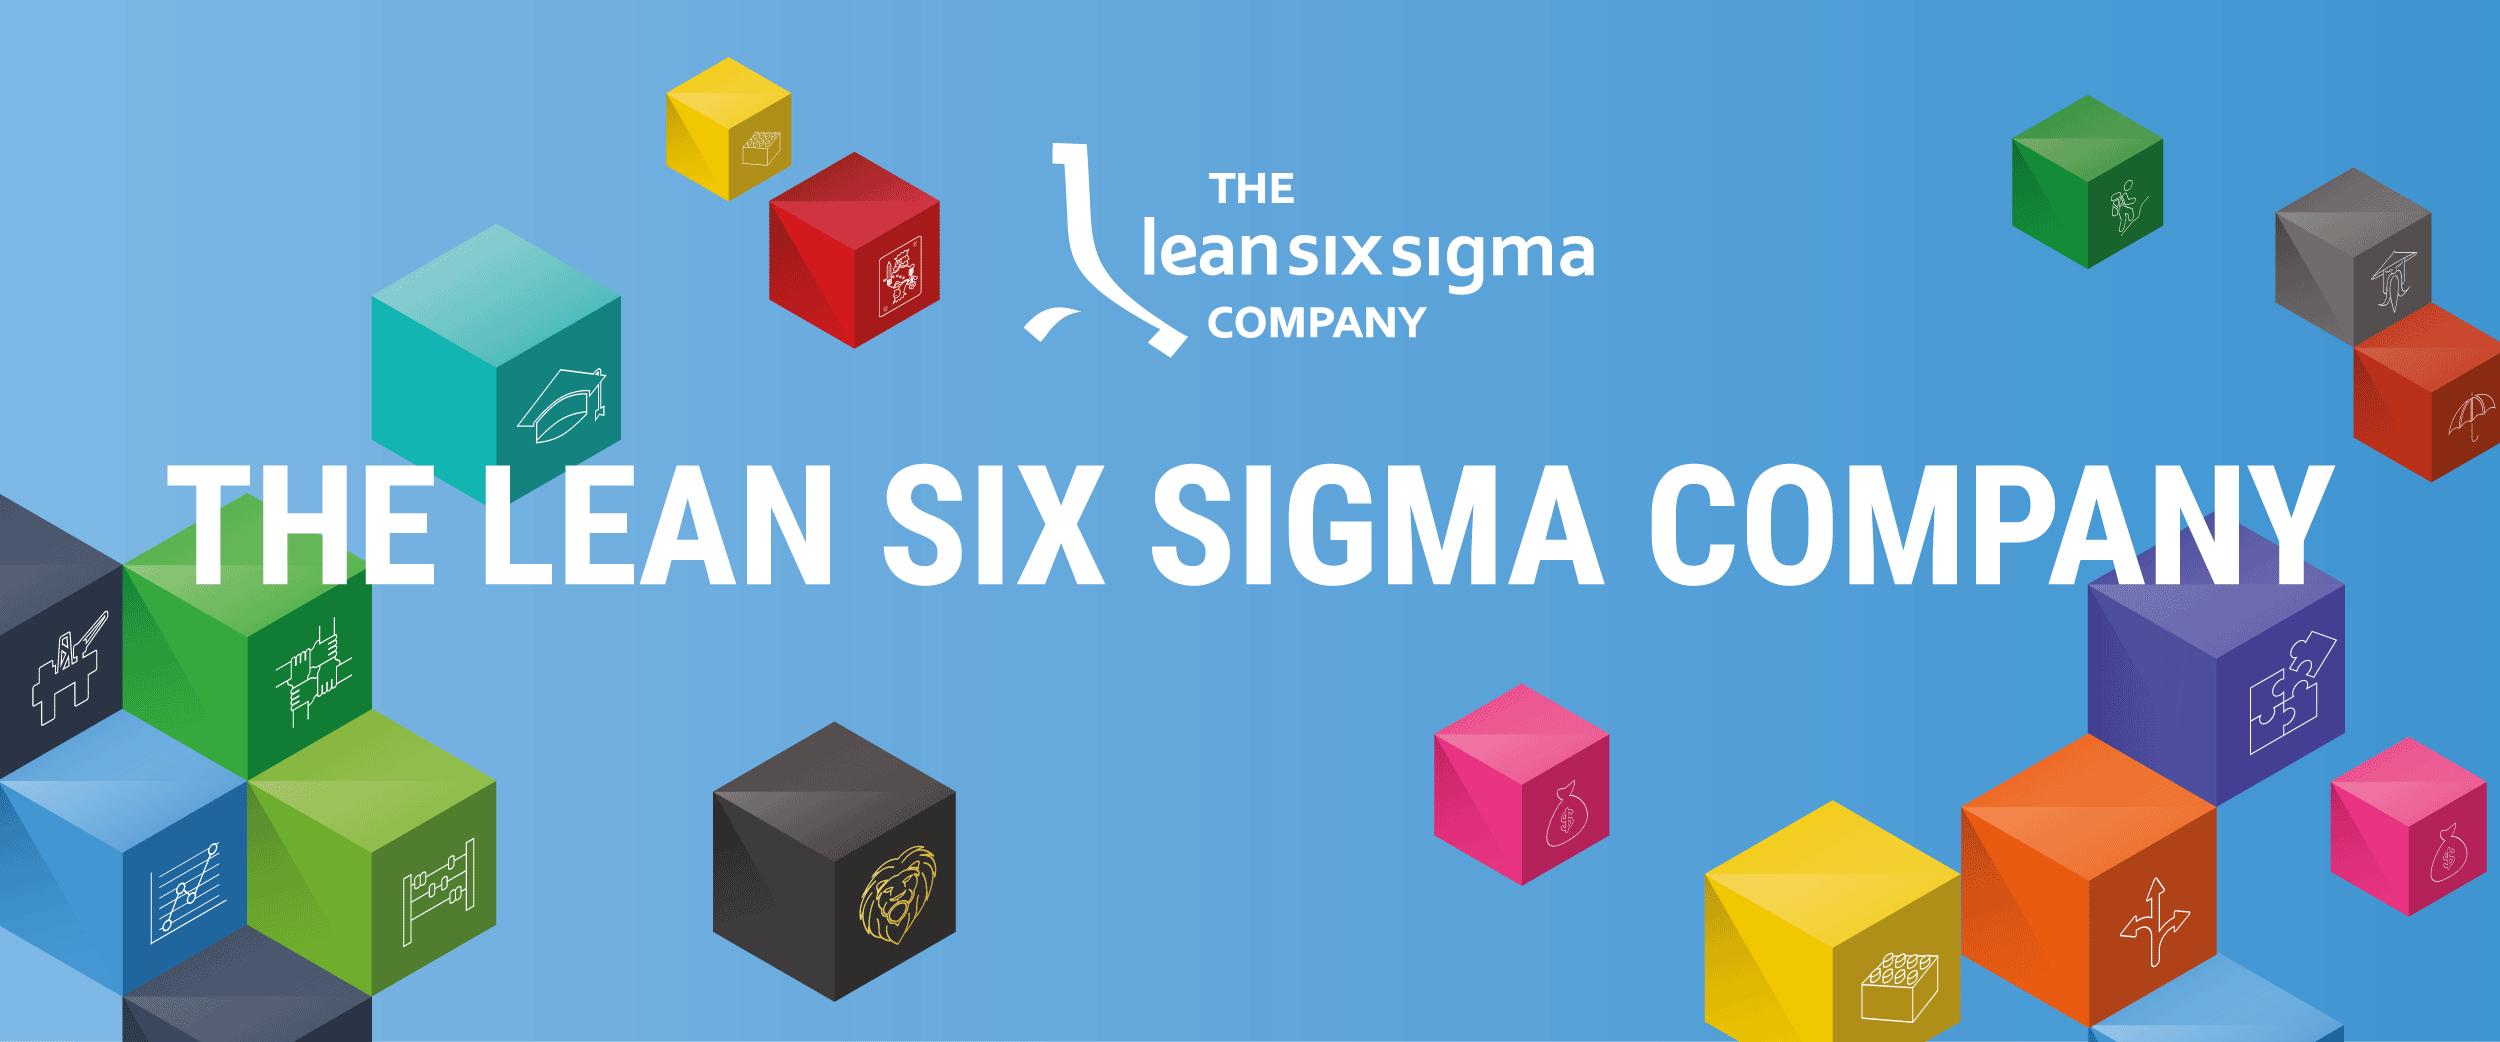 The lean Six Sigma Company